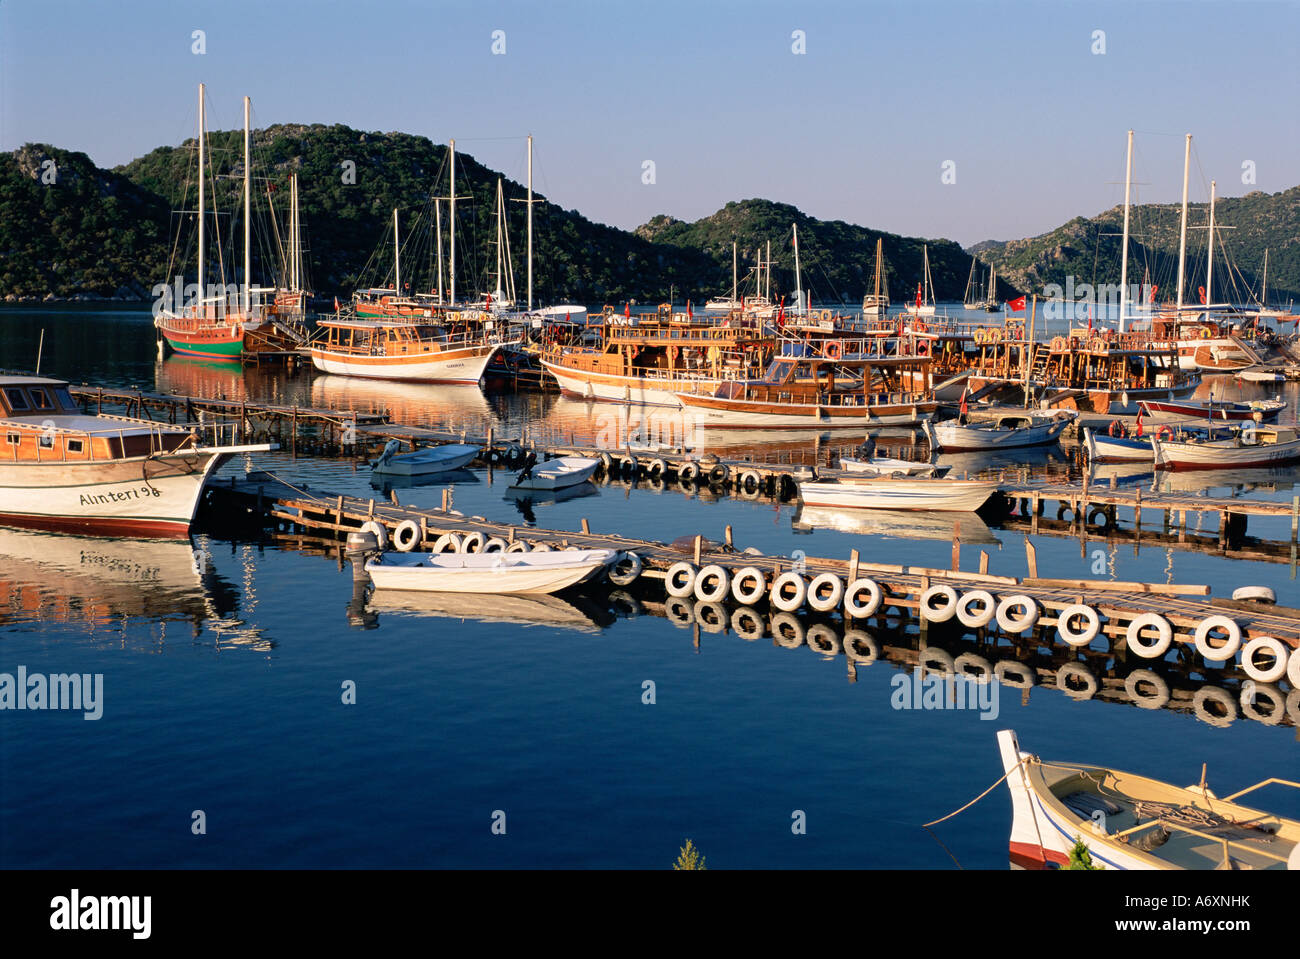 Village of Ucagiz Kekova Bay Lycia Anatolia Turkey Asia Minor Asia Stock Photo